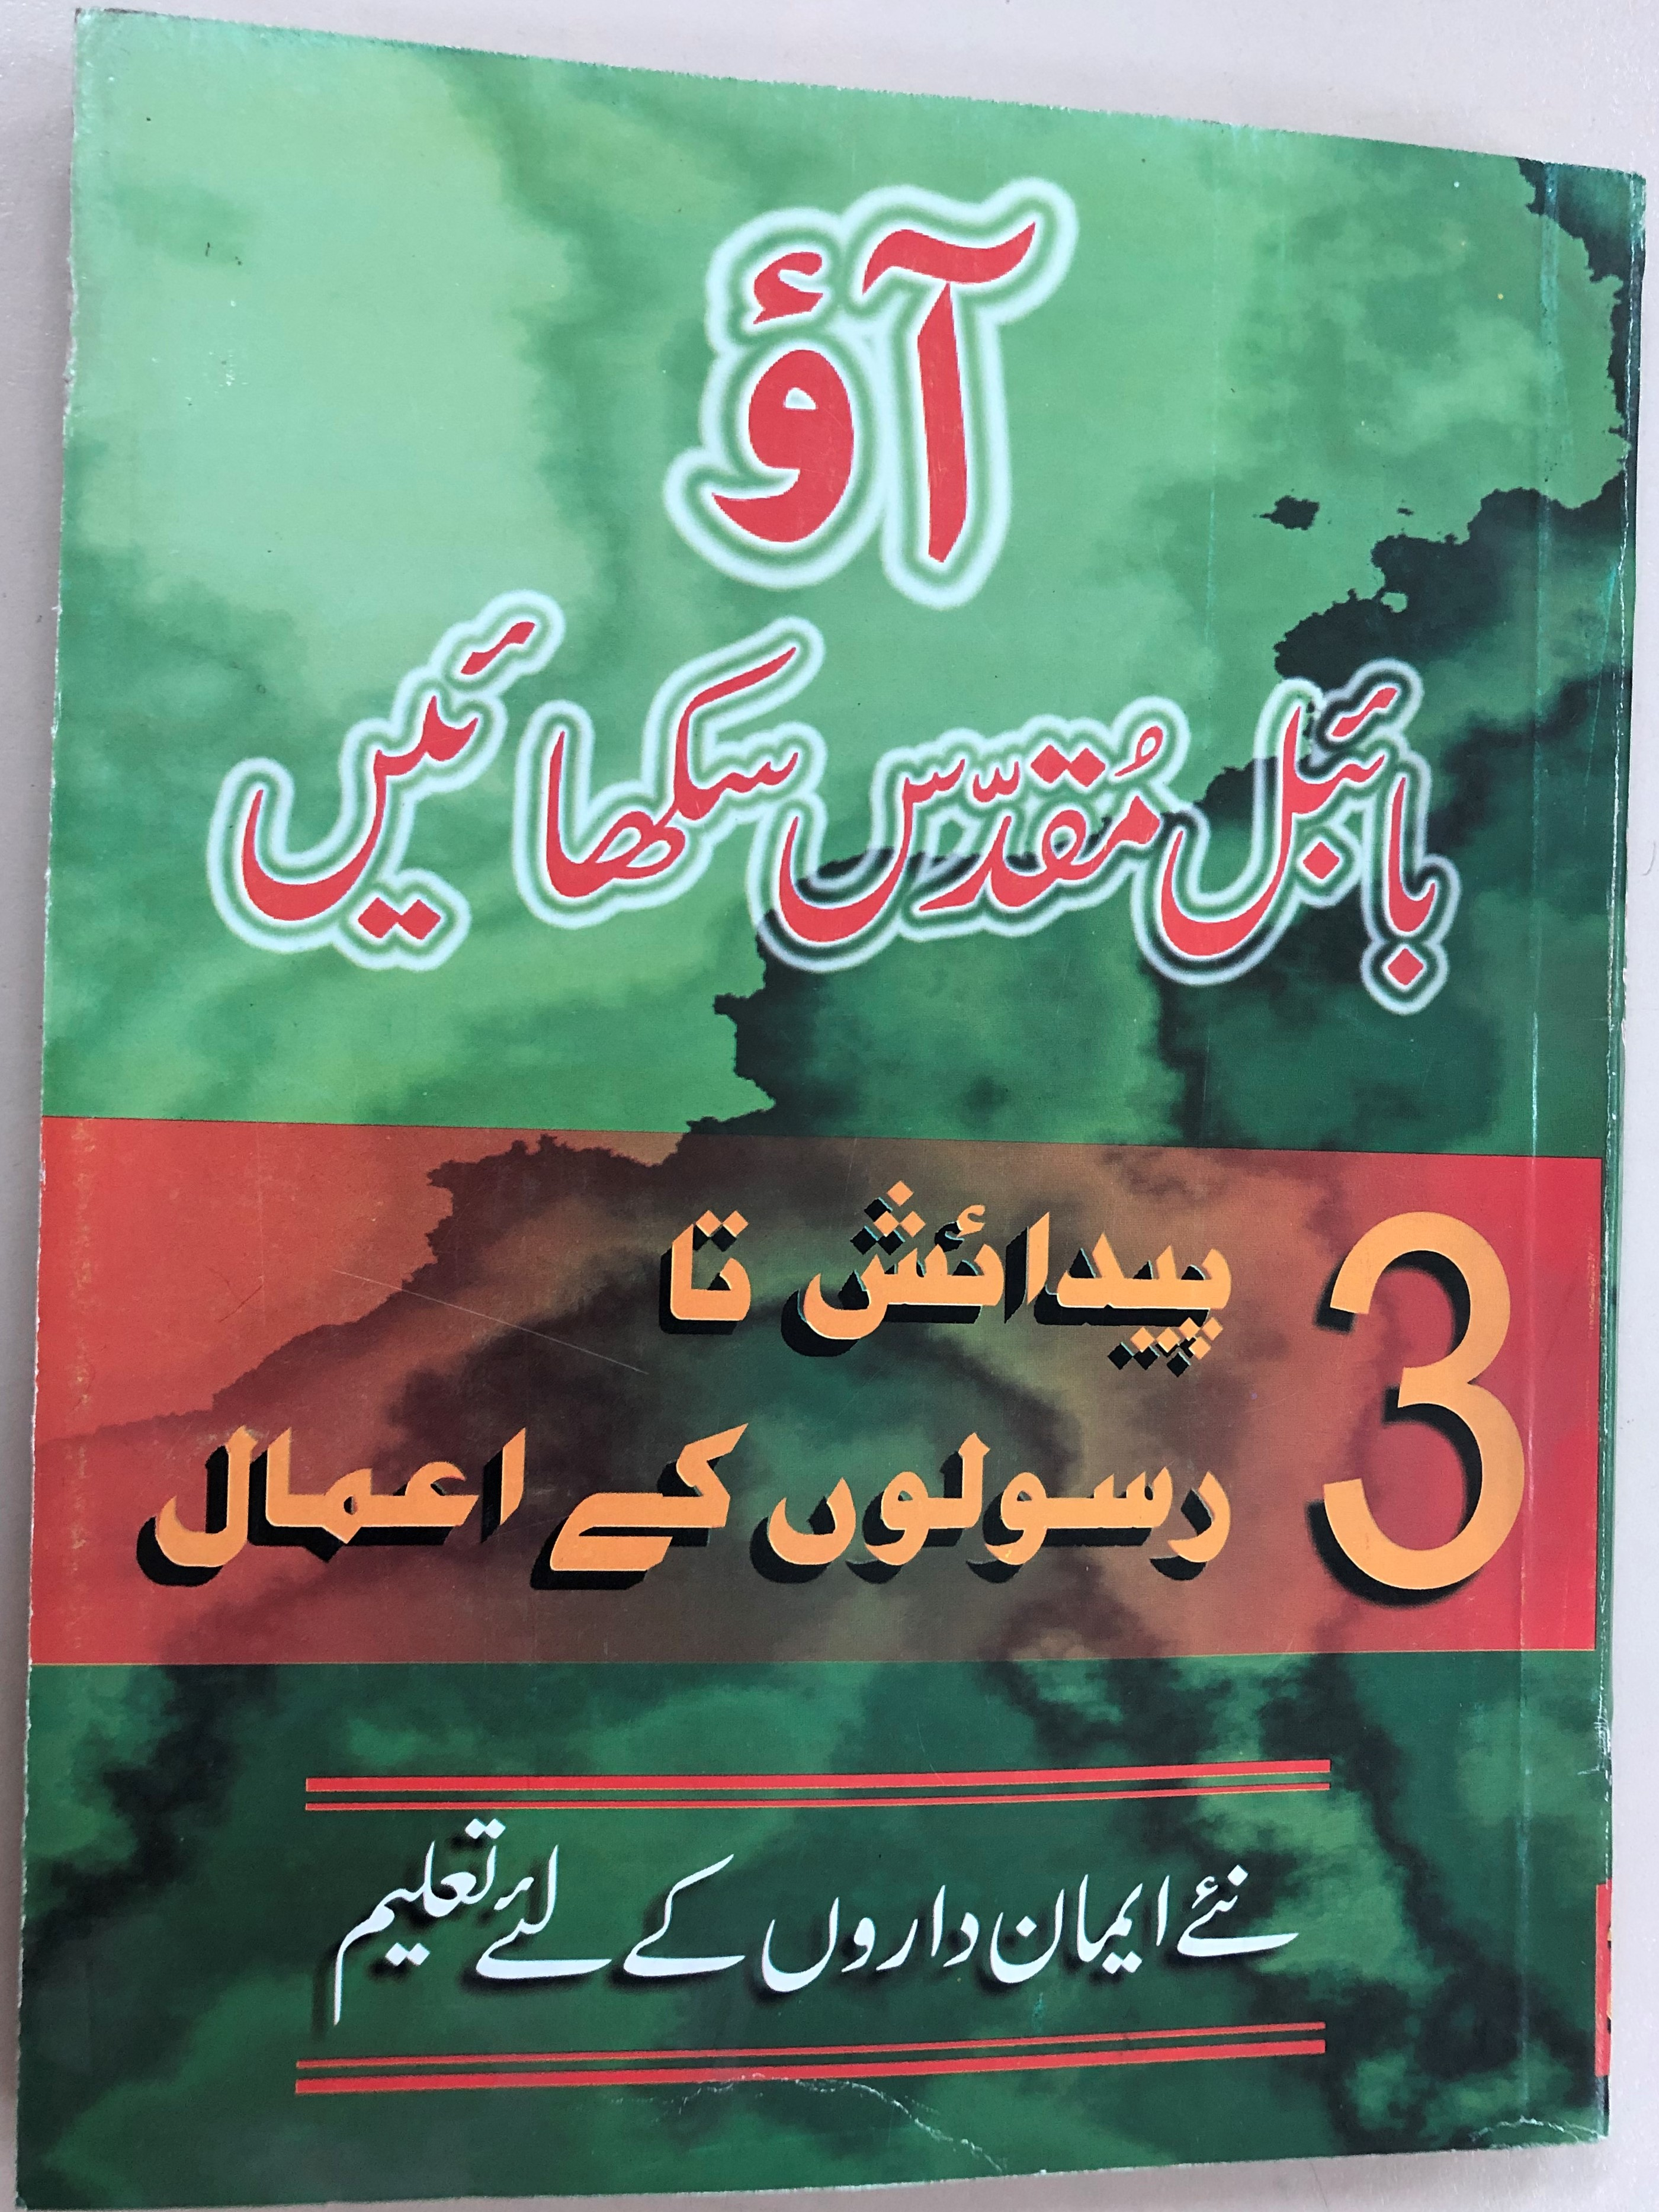 building-on-firm-foundations-vol.3-by-trevor-mcilwain-urdu-edition-evangelism-the-old-testament-pakistan-2007-1-.jpg